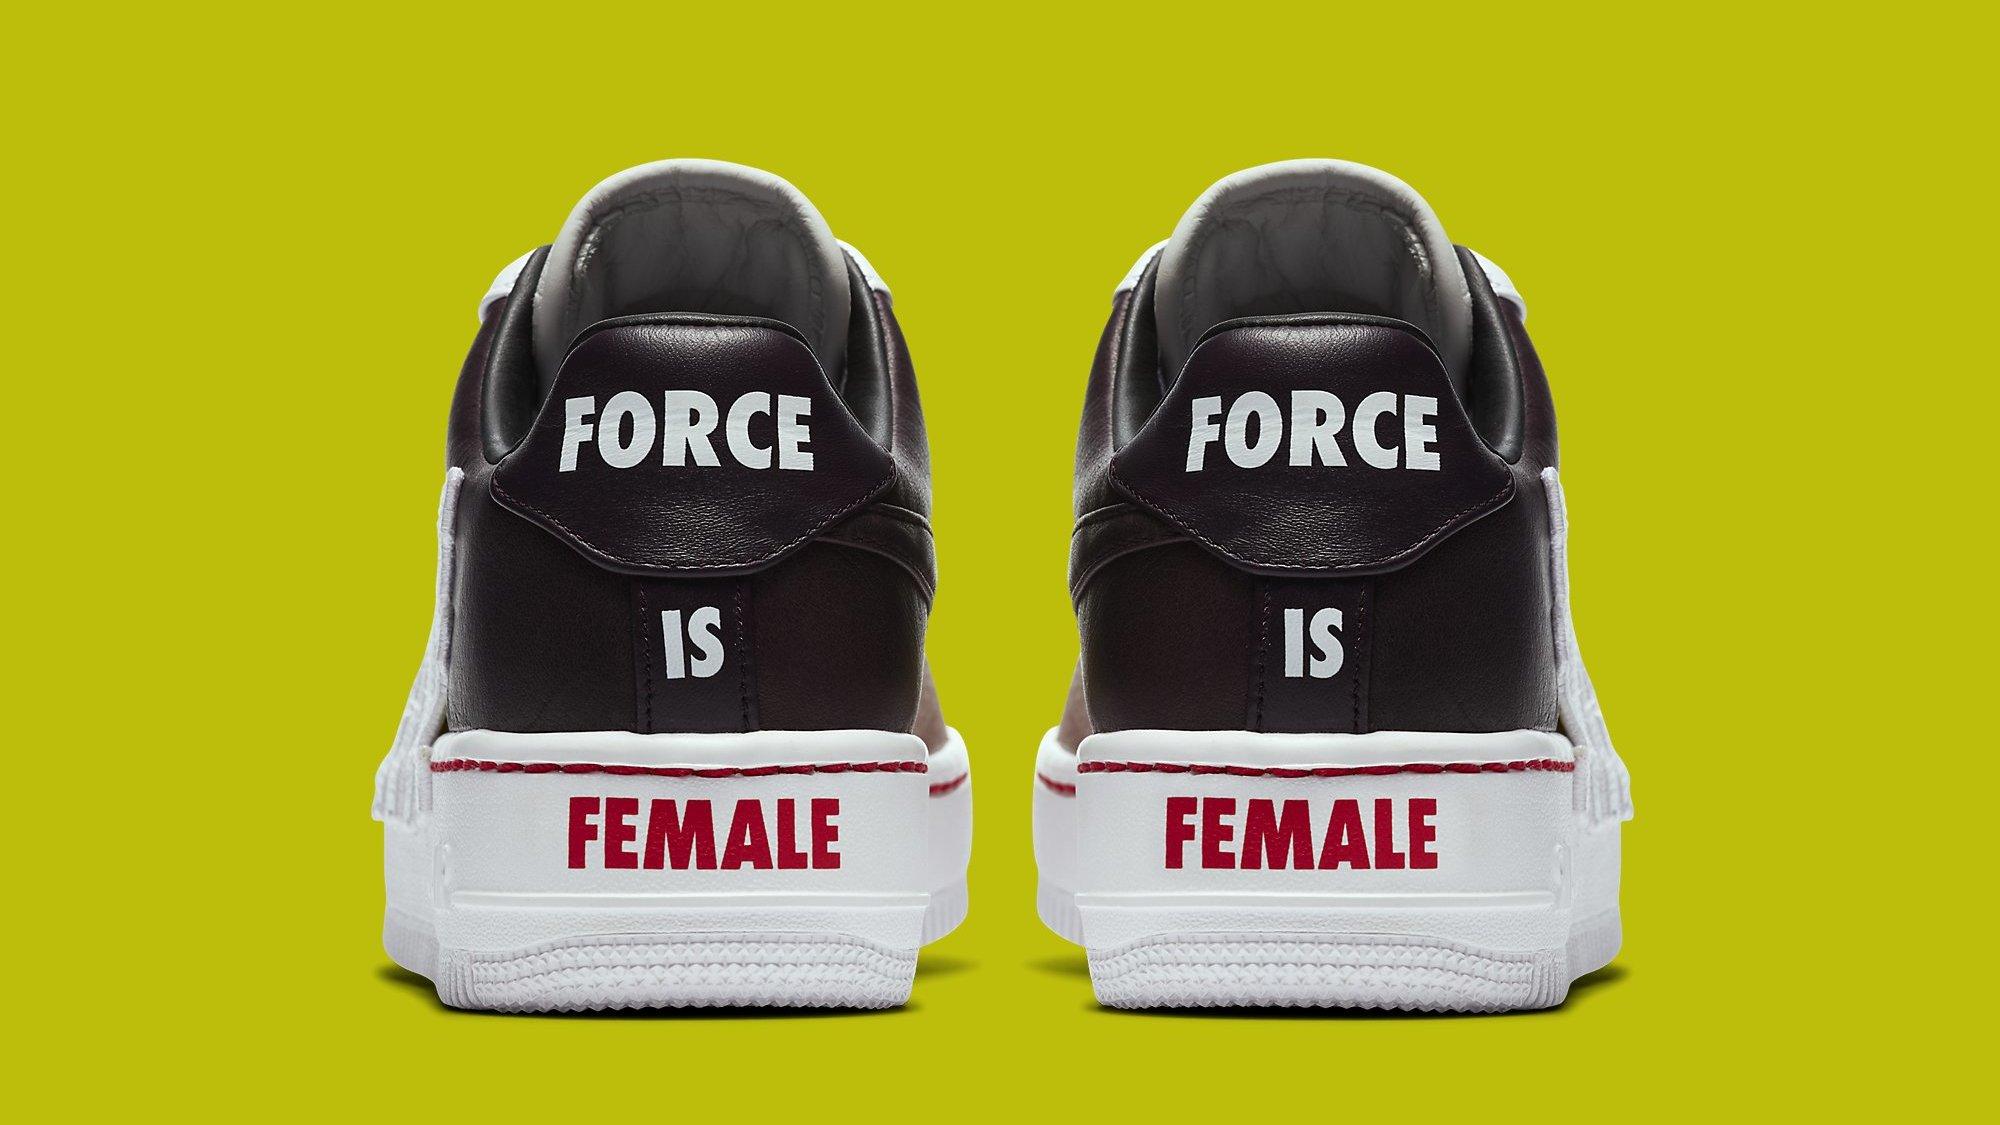 new style 033e9 f91c8 Nike Air Force 1 Upstep LX Releasing Feb. 15, 2018. | Sole ...